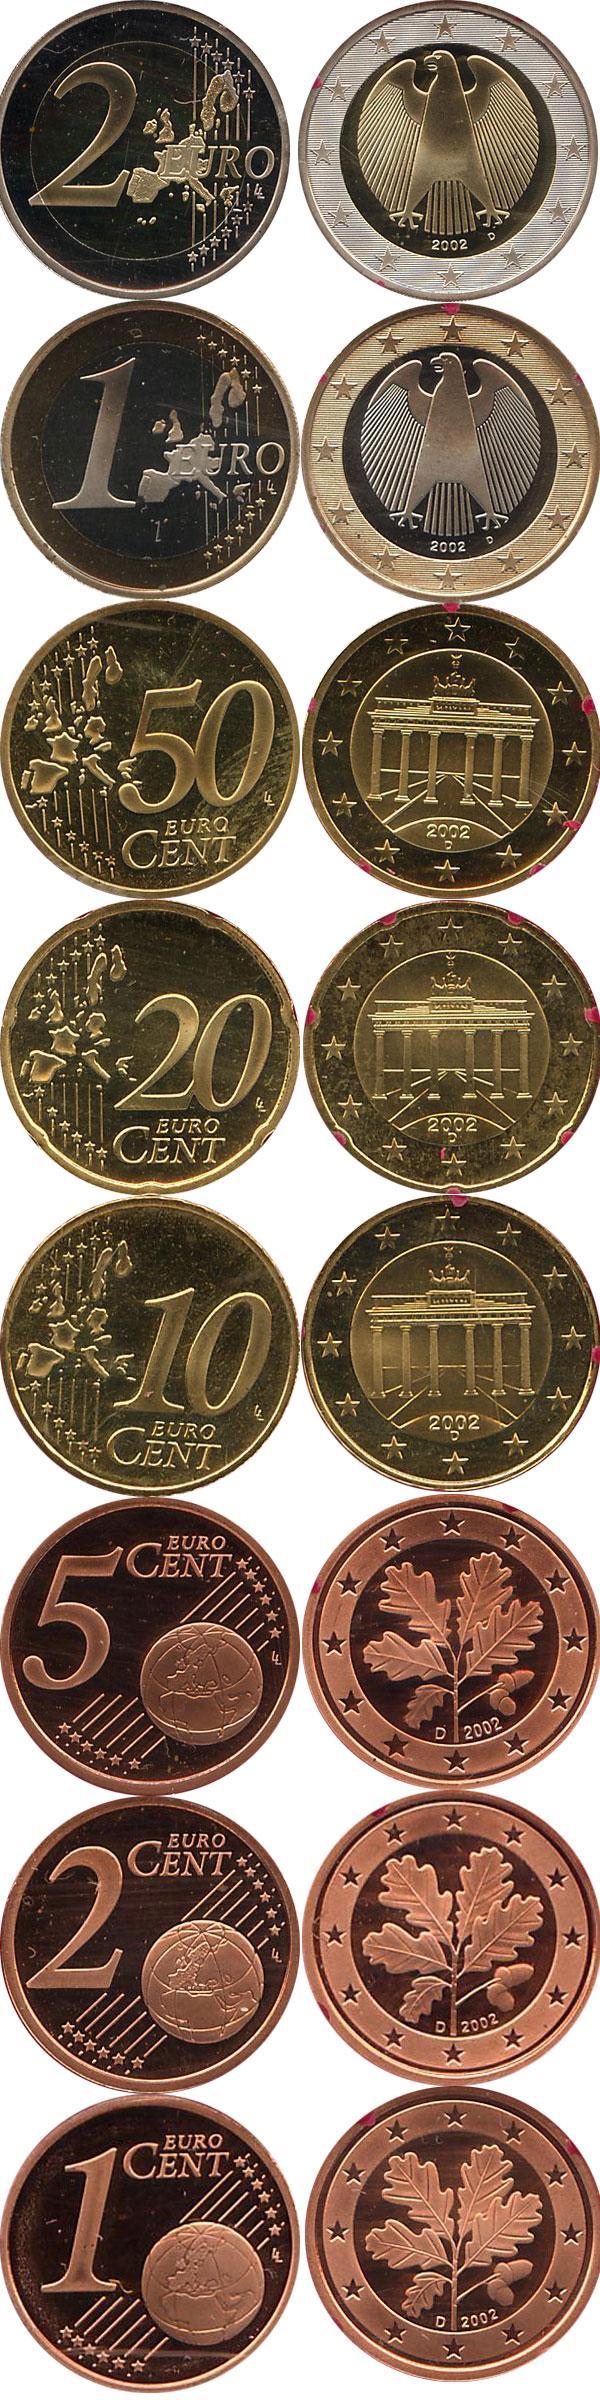 Каталог монет - Германия Выпуск 2002 года, Чеканка Мюнхена